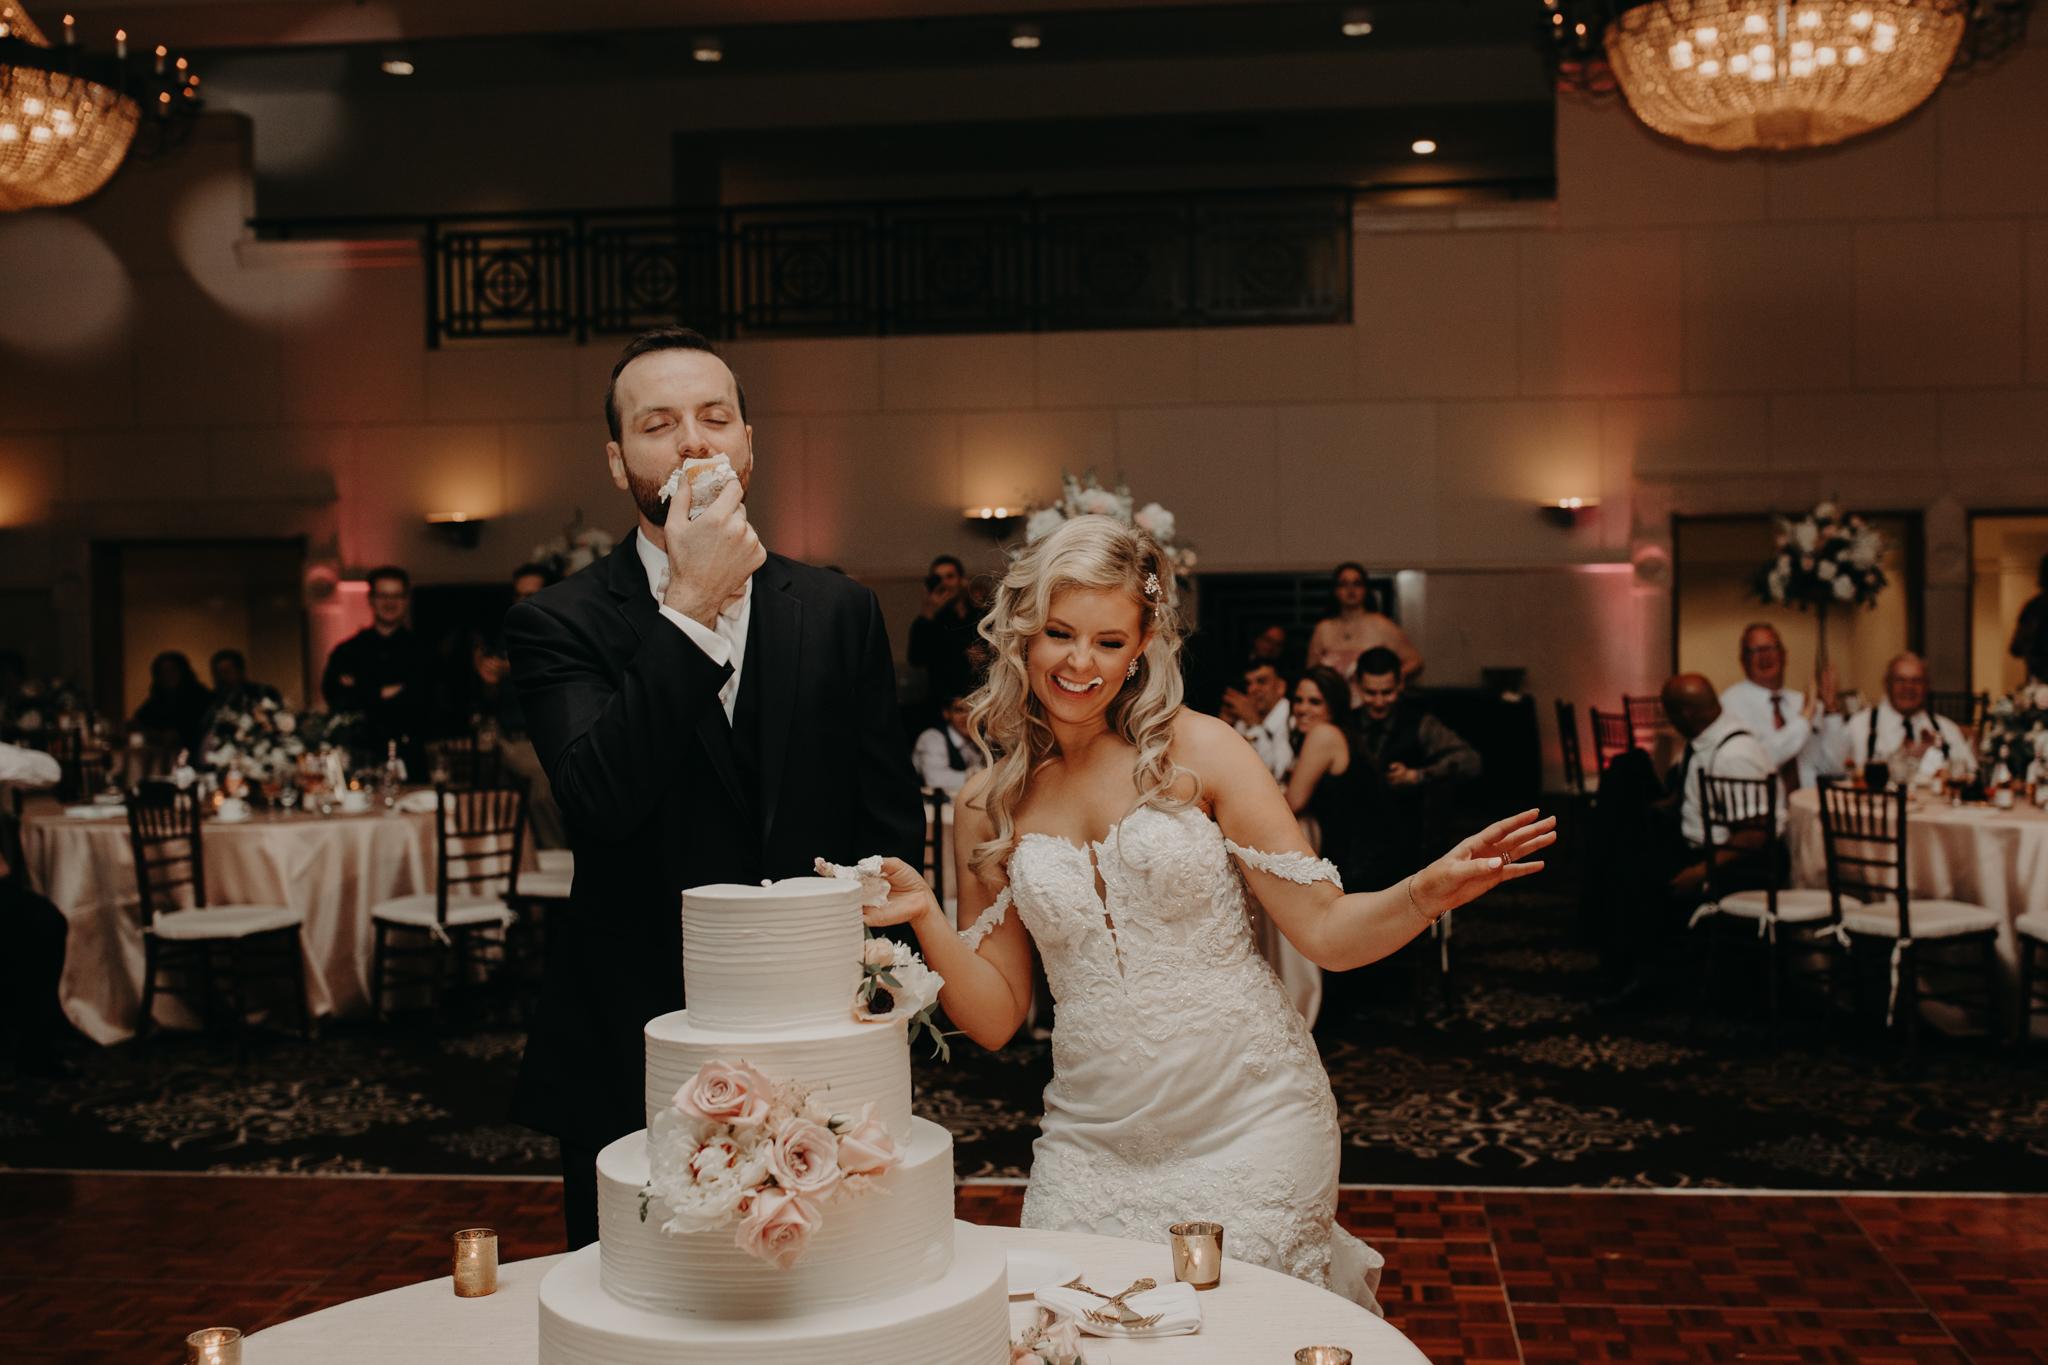 The-Inn-At-St-Johns-Wedding-59.jpg